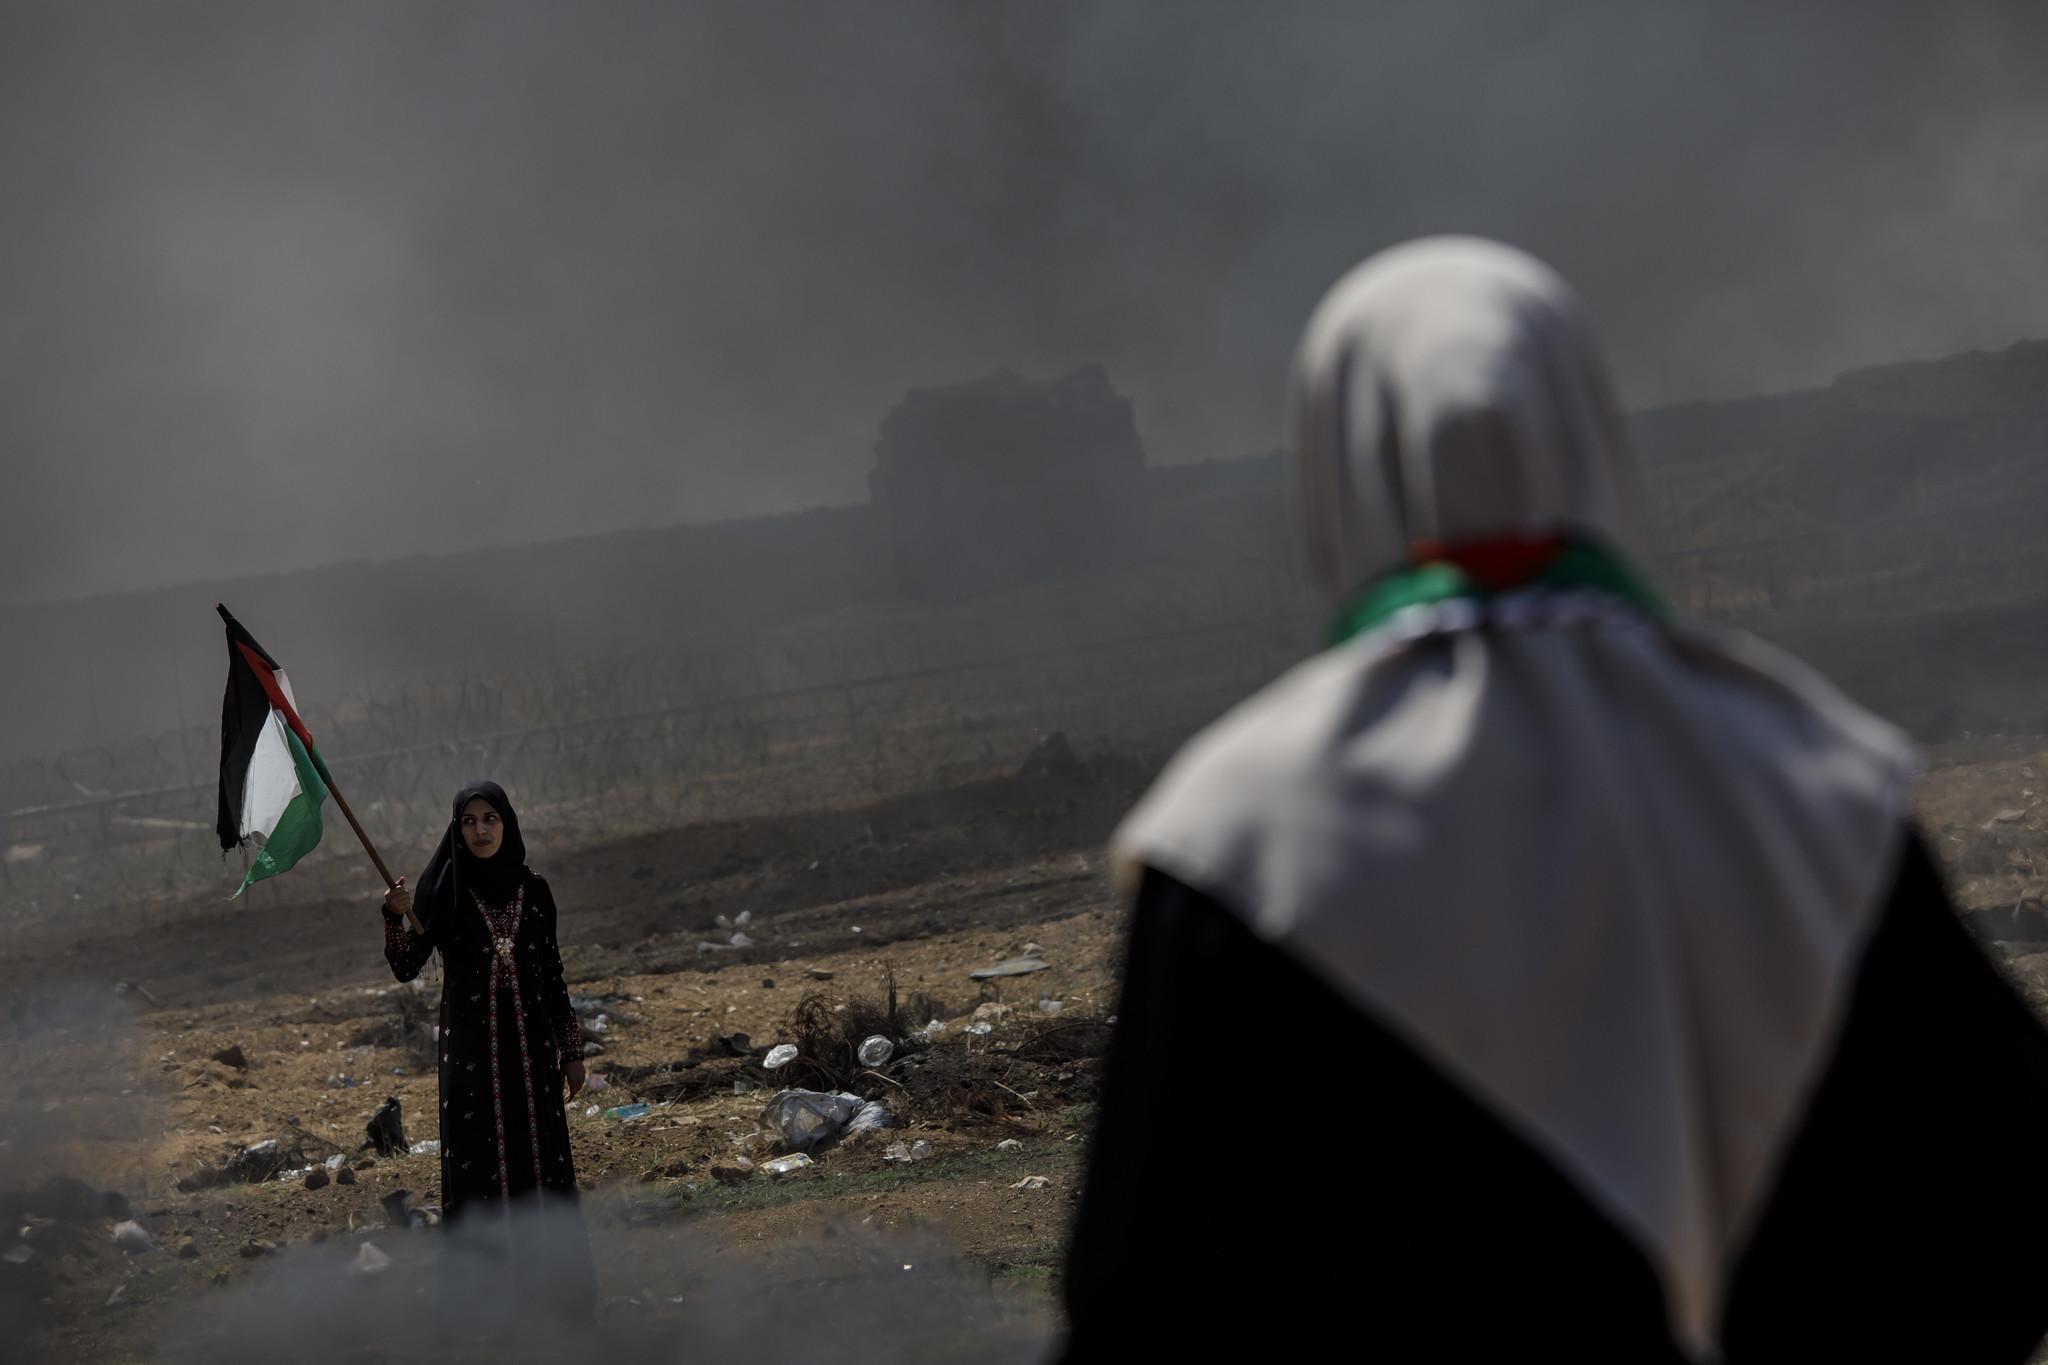 GAZA CITY, GAZA — SUNDAY, MAY 13, 2018: A Palestinian woman wanders the area close to the border fe